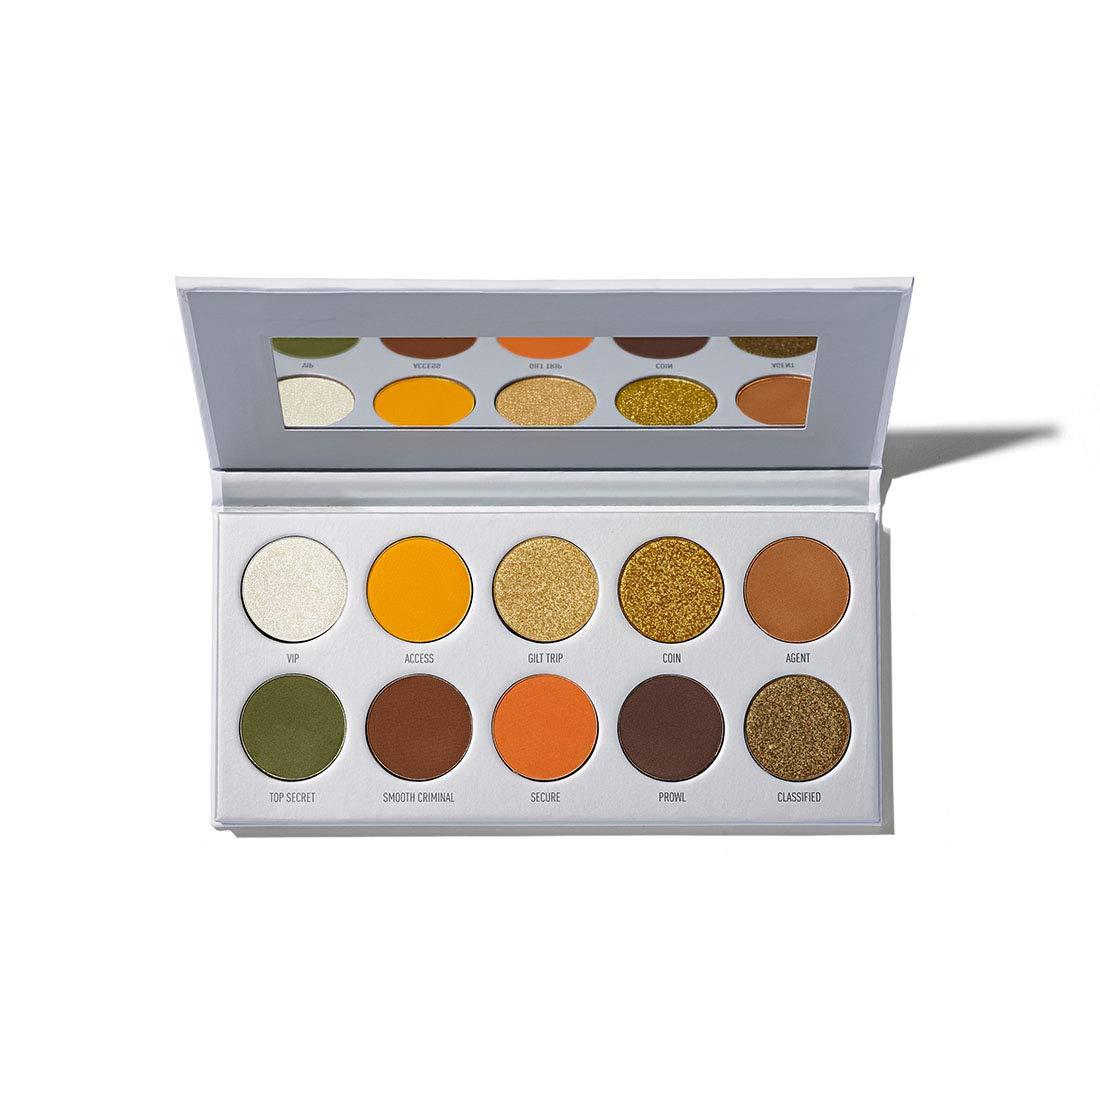 Morphe X Jaclyn Hill - Armed & Gorgeous Eyeshadow Palette